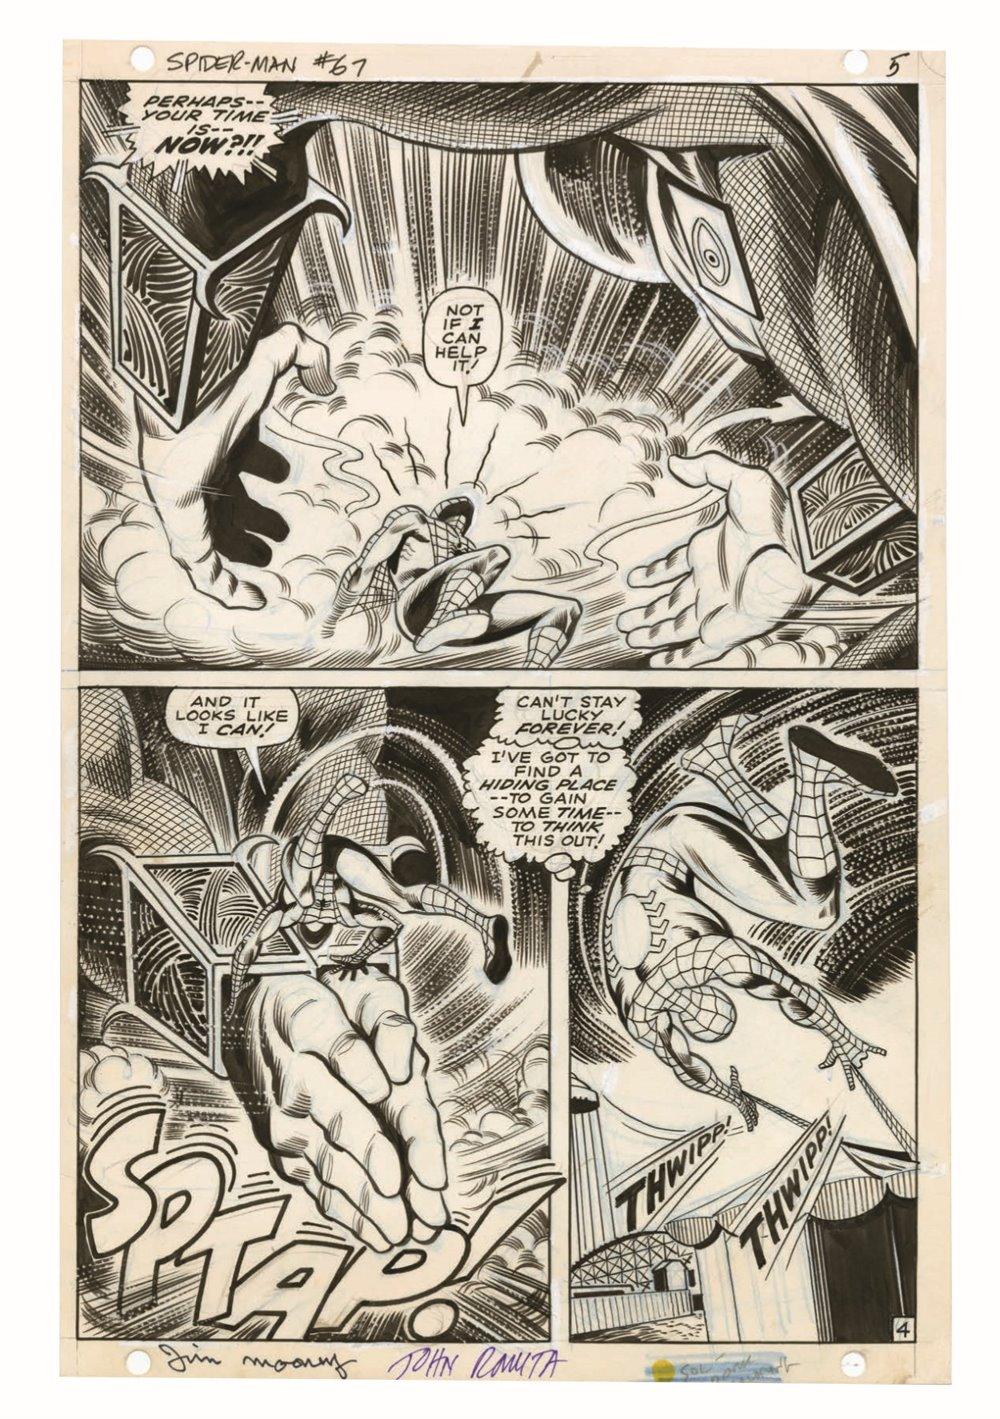 JohnRomita_Spidermand_Artisan_pr-6 ComicList Previews: JOHN ROMITA'S THE AMAZING SPIDER-MAN ARTISAN EDITION TP